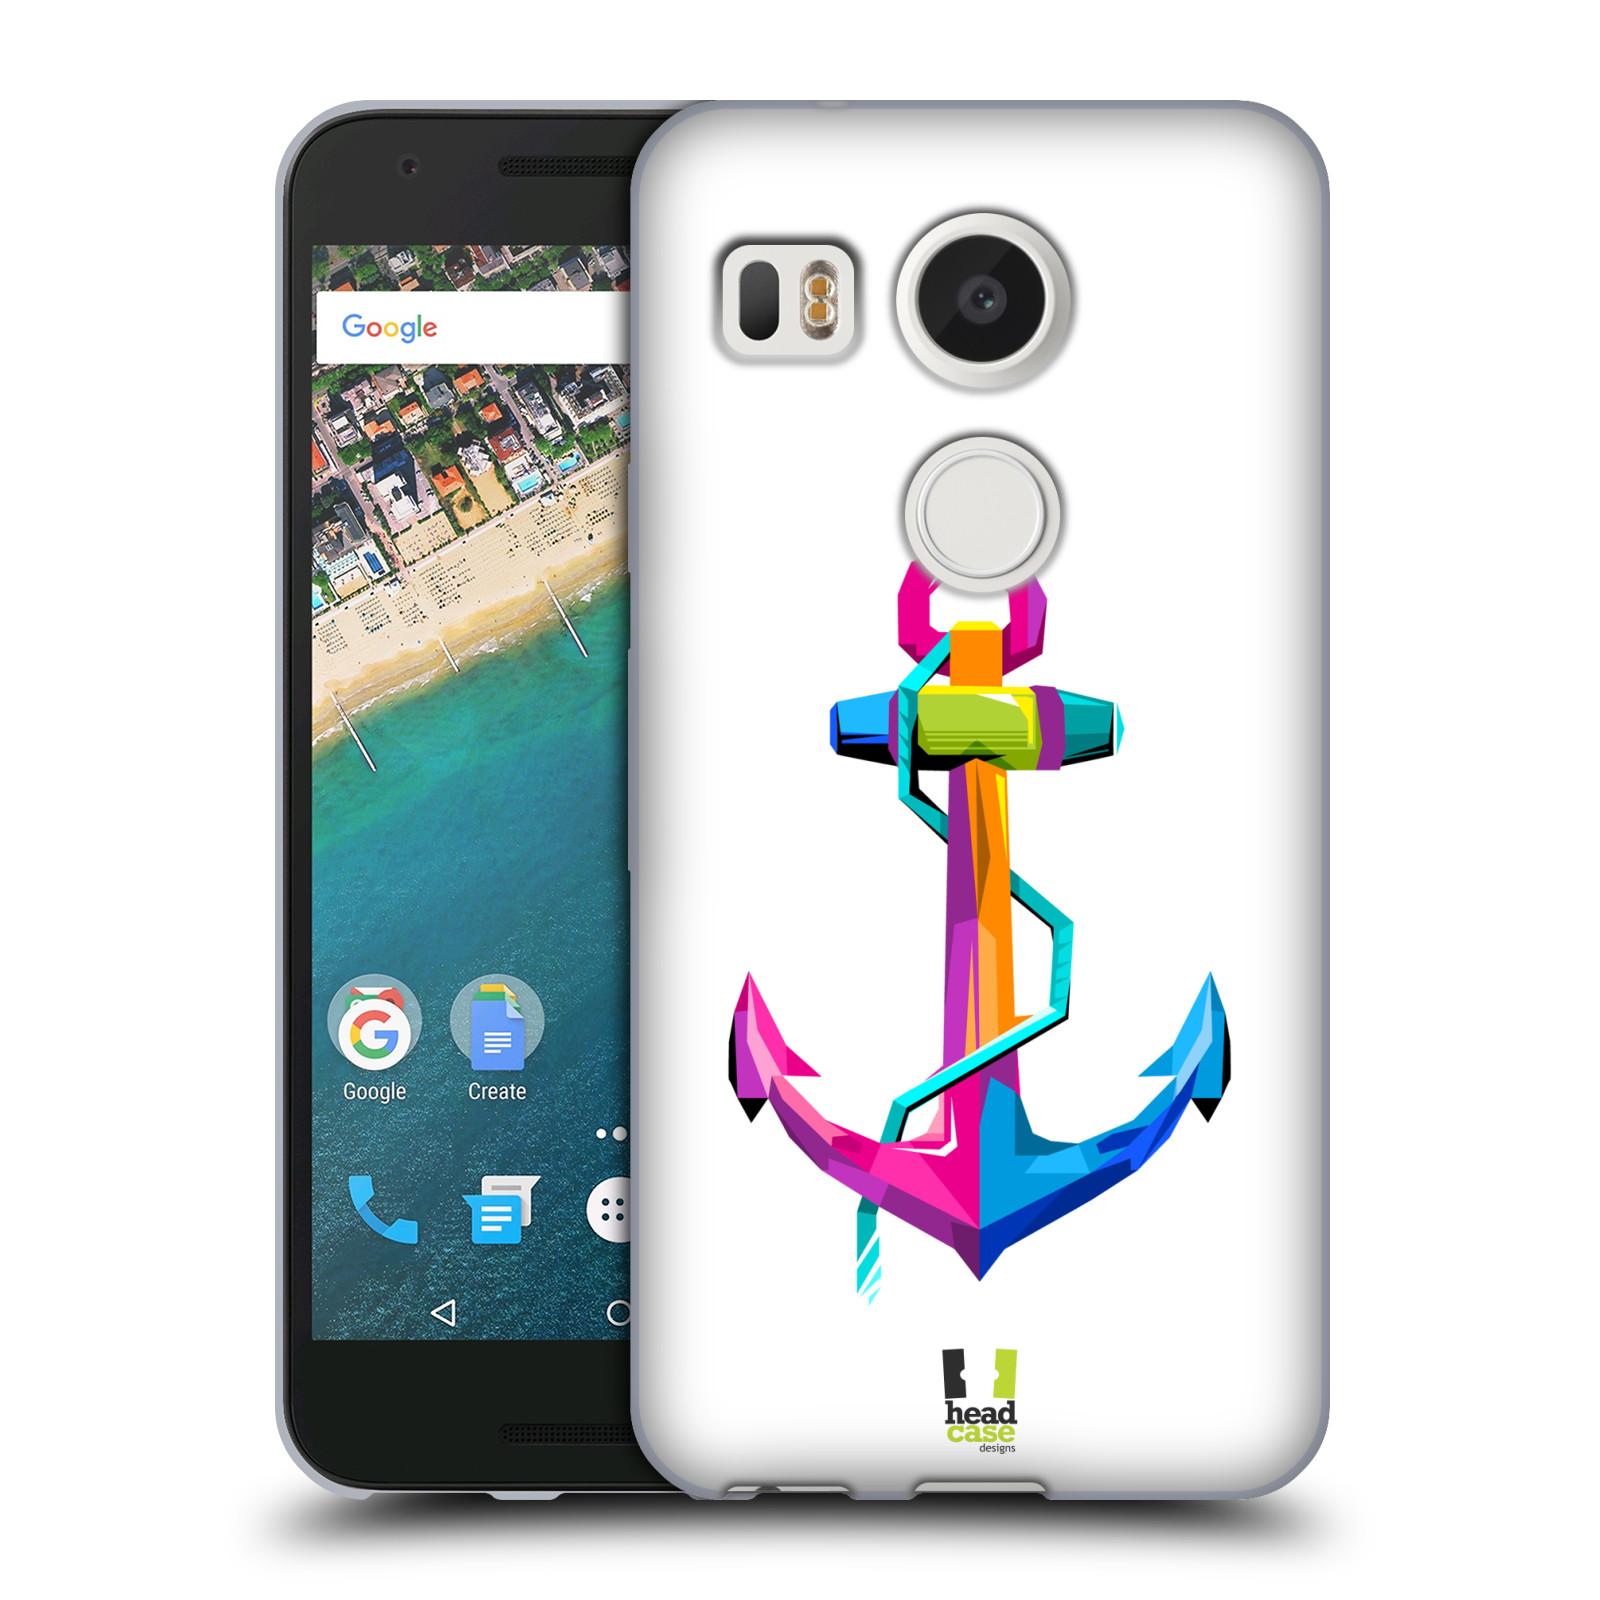 HEAD CASE silikonový obal na mobil LG NEXUS 5X vzor POP ART kubismus kotva naděje